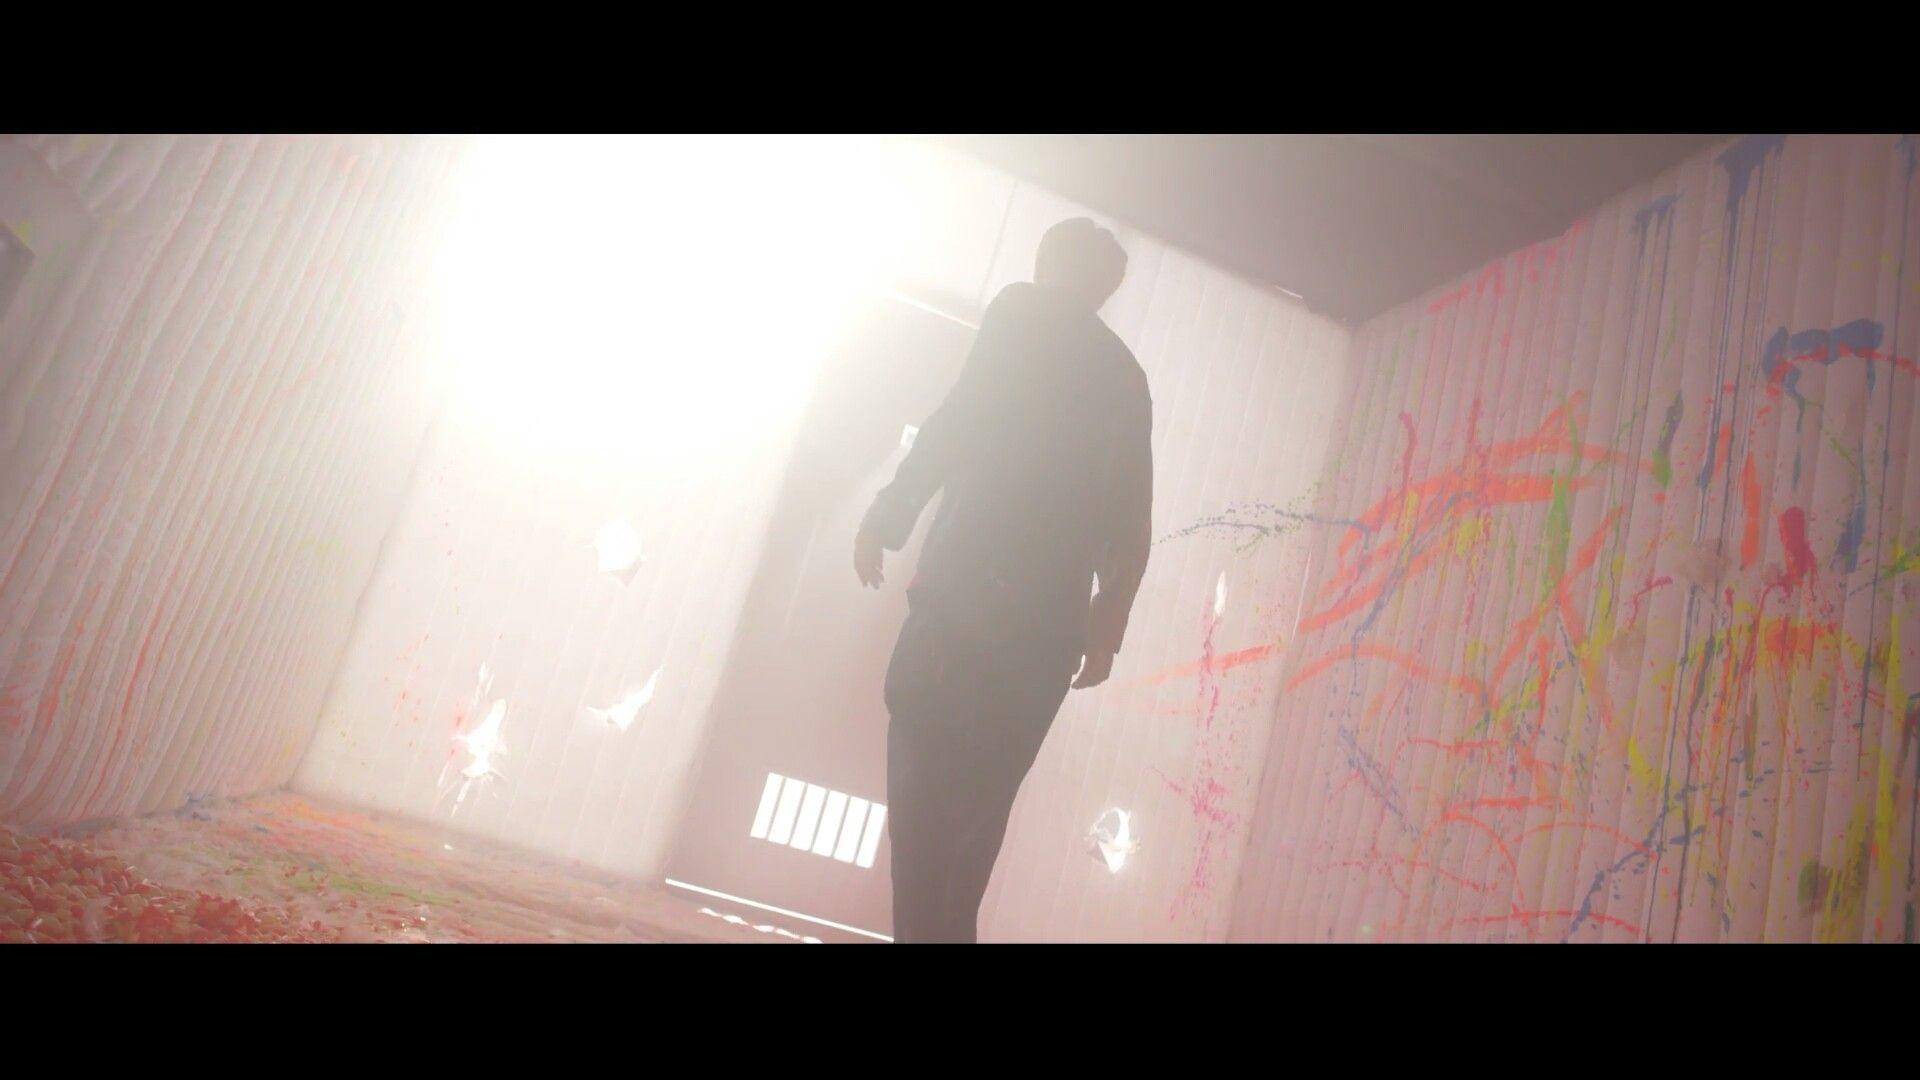 J-Hope ❤ 방탄소년단 (BTS) WINGS Short Film #6 MAMA #BTS #방탄소년단